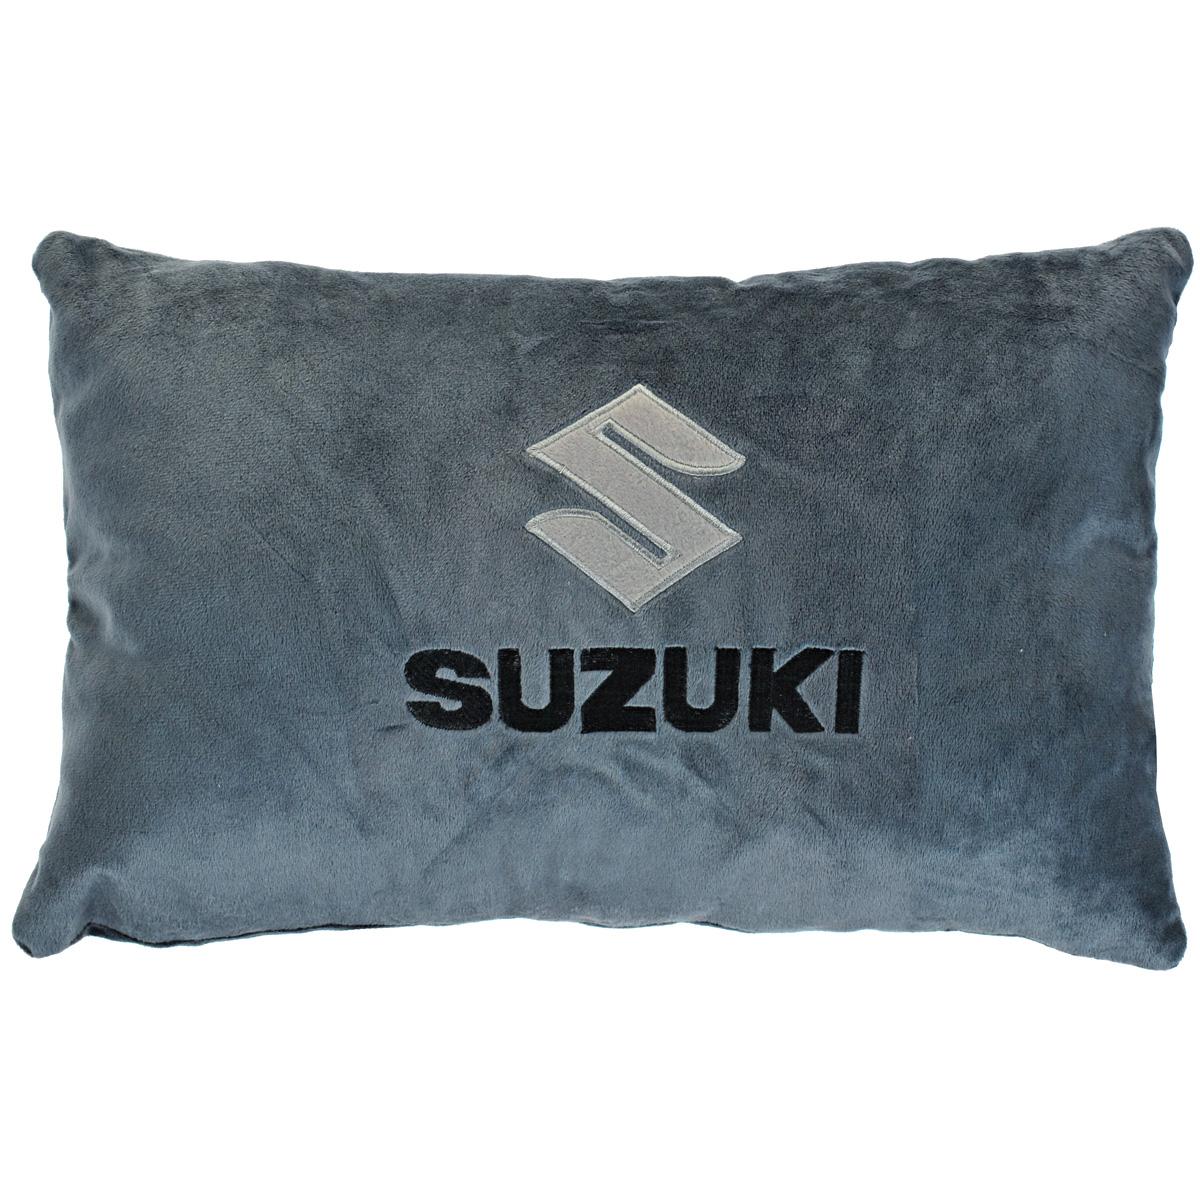 "Подушка автомобильная ""Suzuki"", цвет: серый, 41 см х 25 см х 14 см, Maxi Toys"